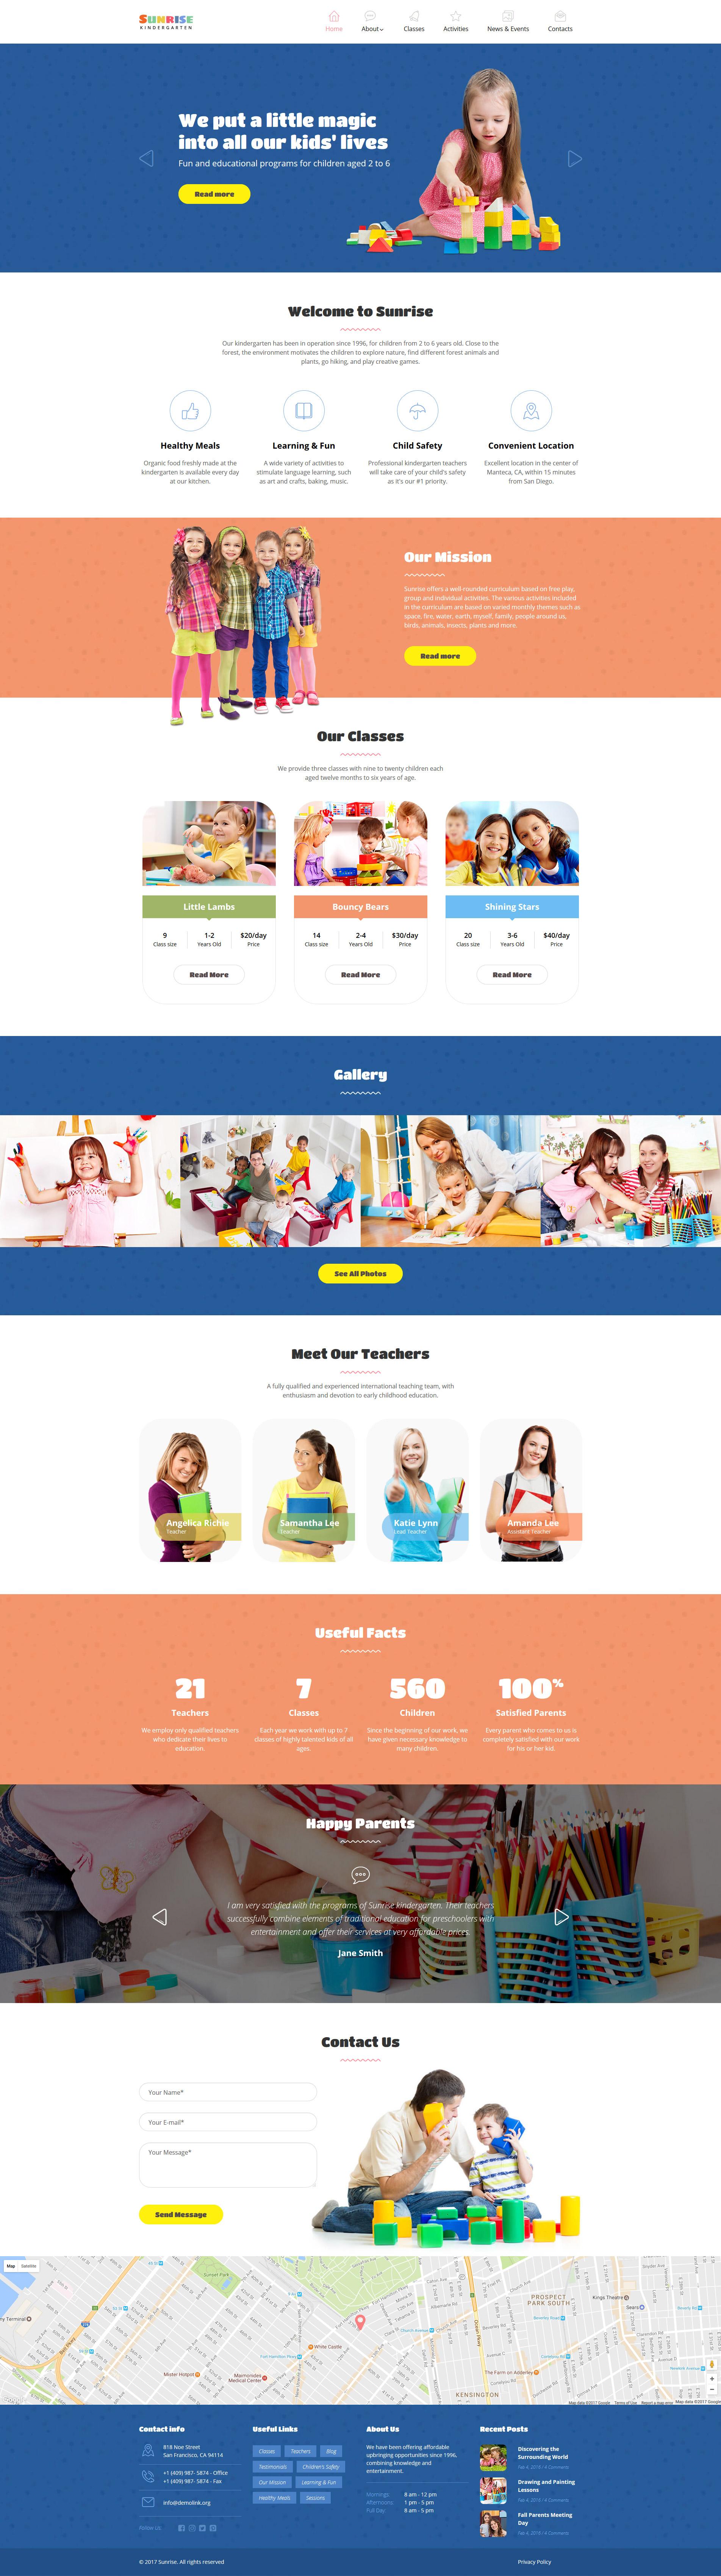 Web Site Templates | Web Page Templates